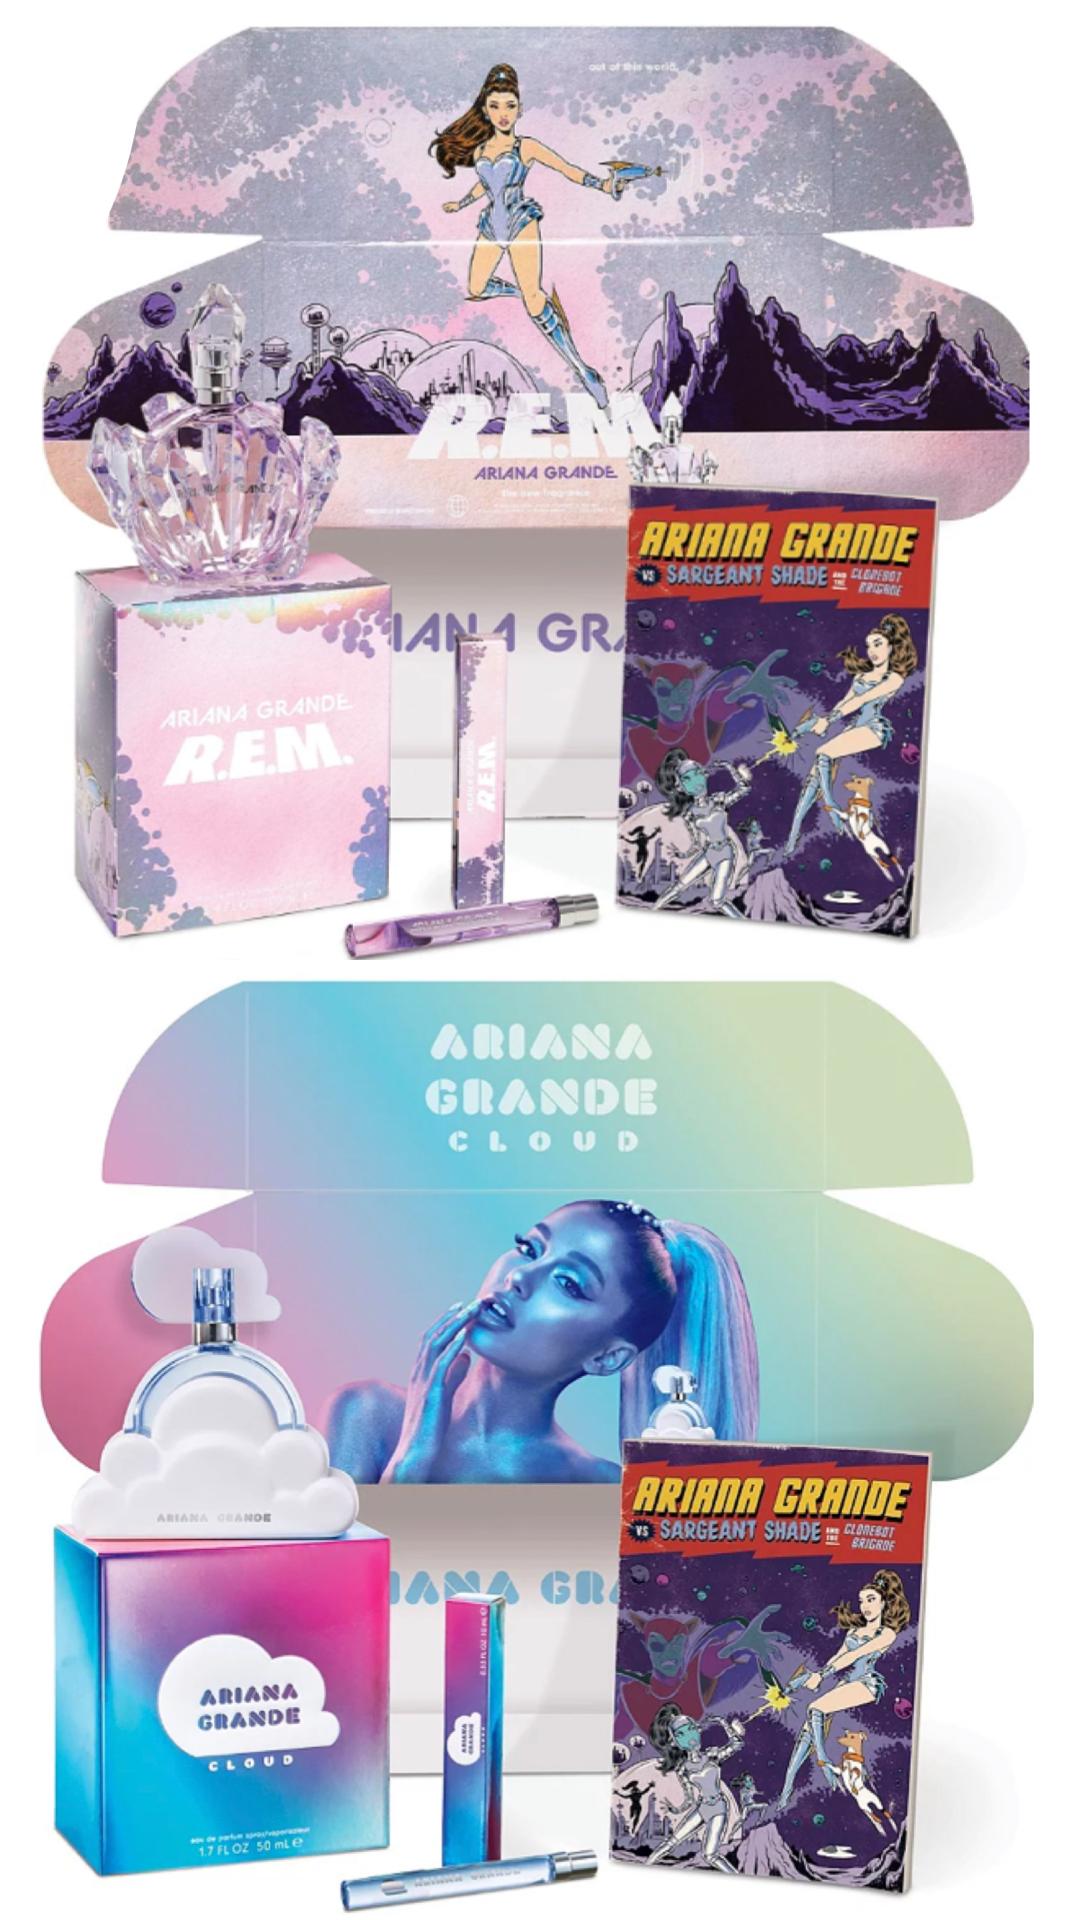 Ariana Grande Cloud Fan Box Set & R.E.M Fan Box Set